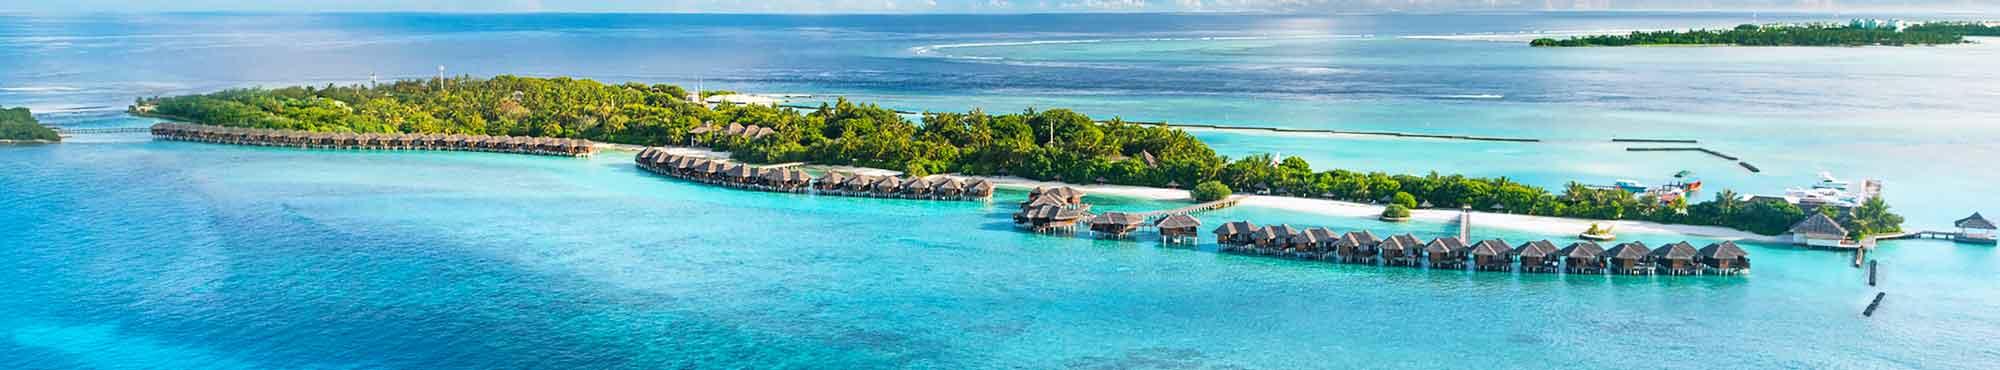 Sheraton-Maldives-Island-Cottage-Slider